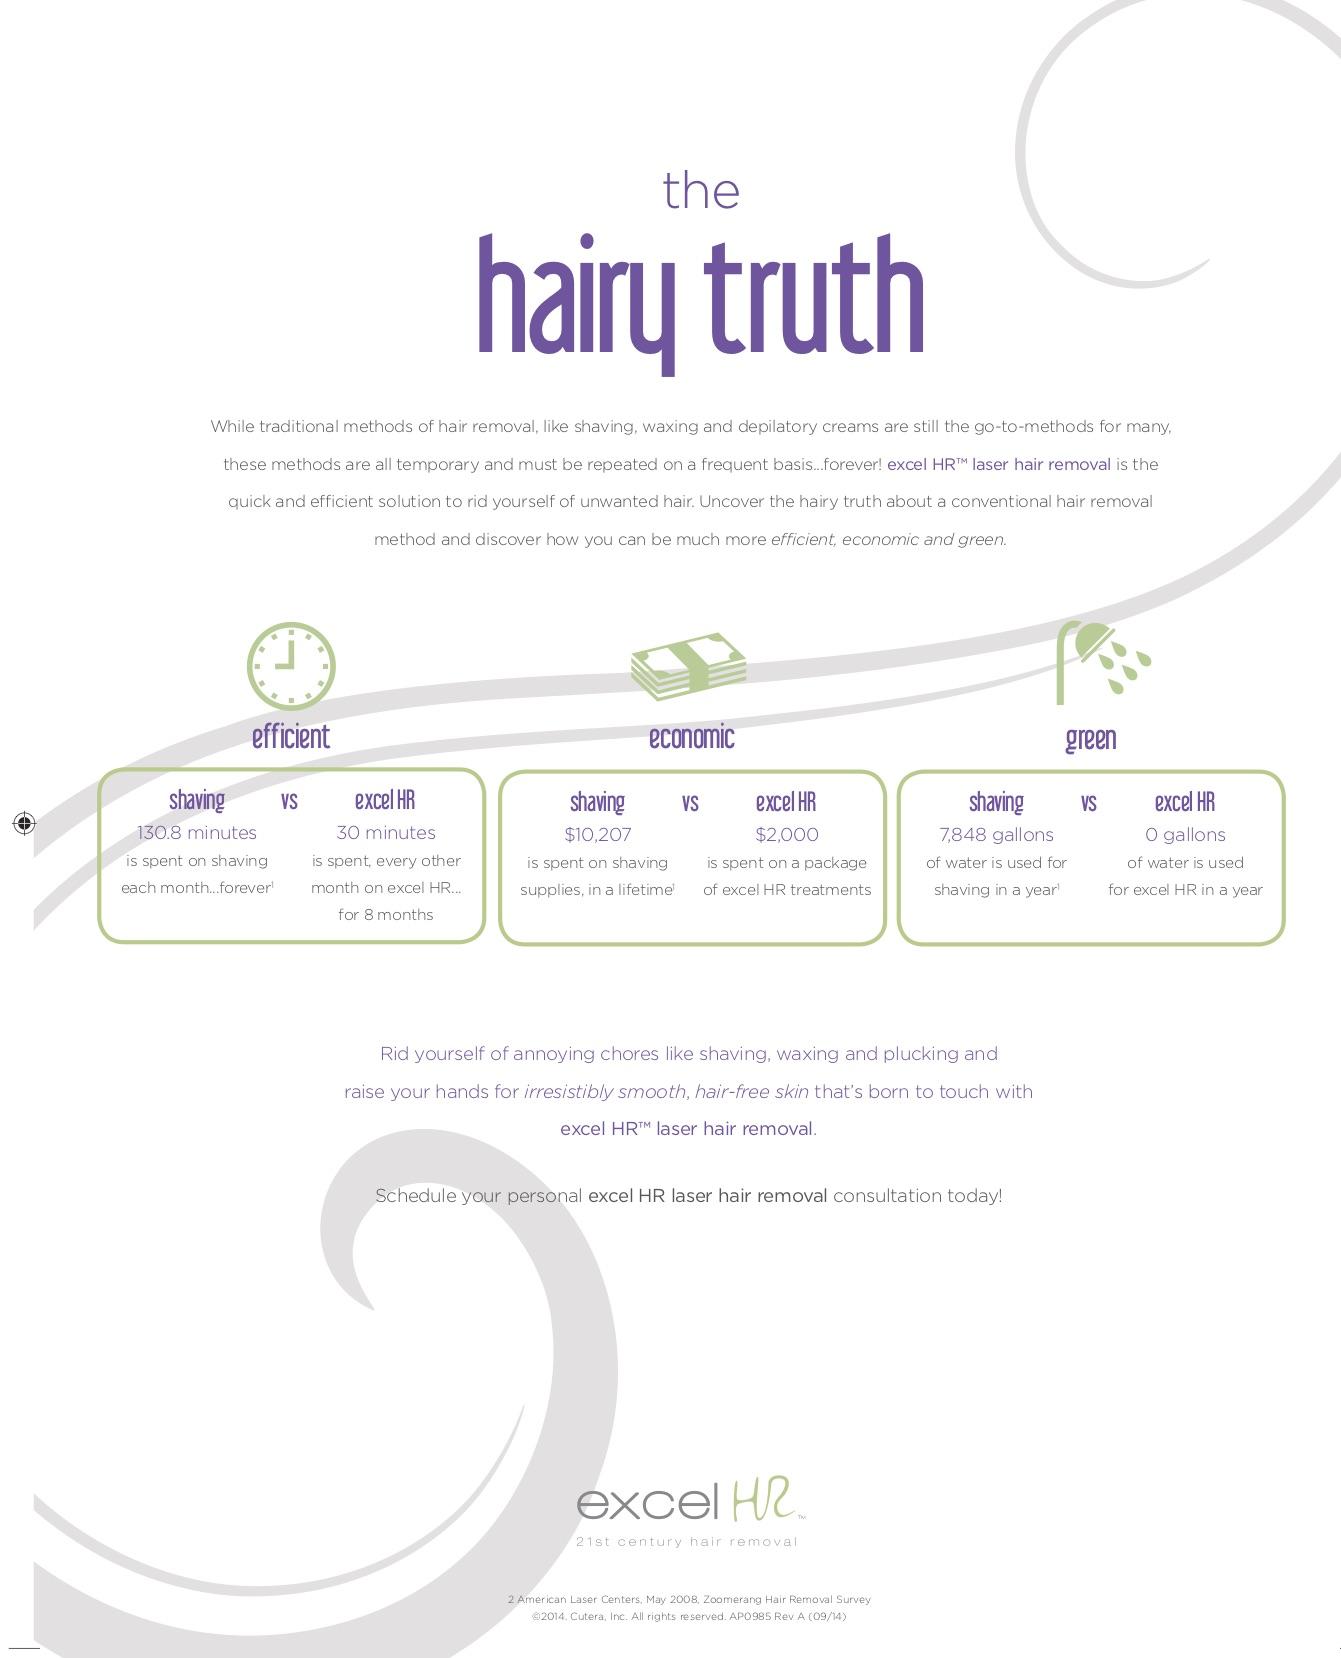 excel HR PSK Promo Ad-hairy-cropmarks.jpg